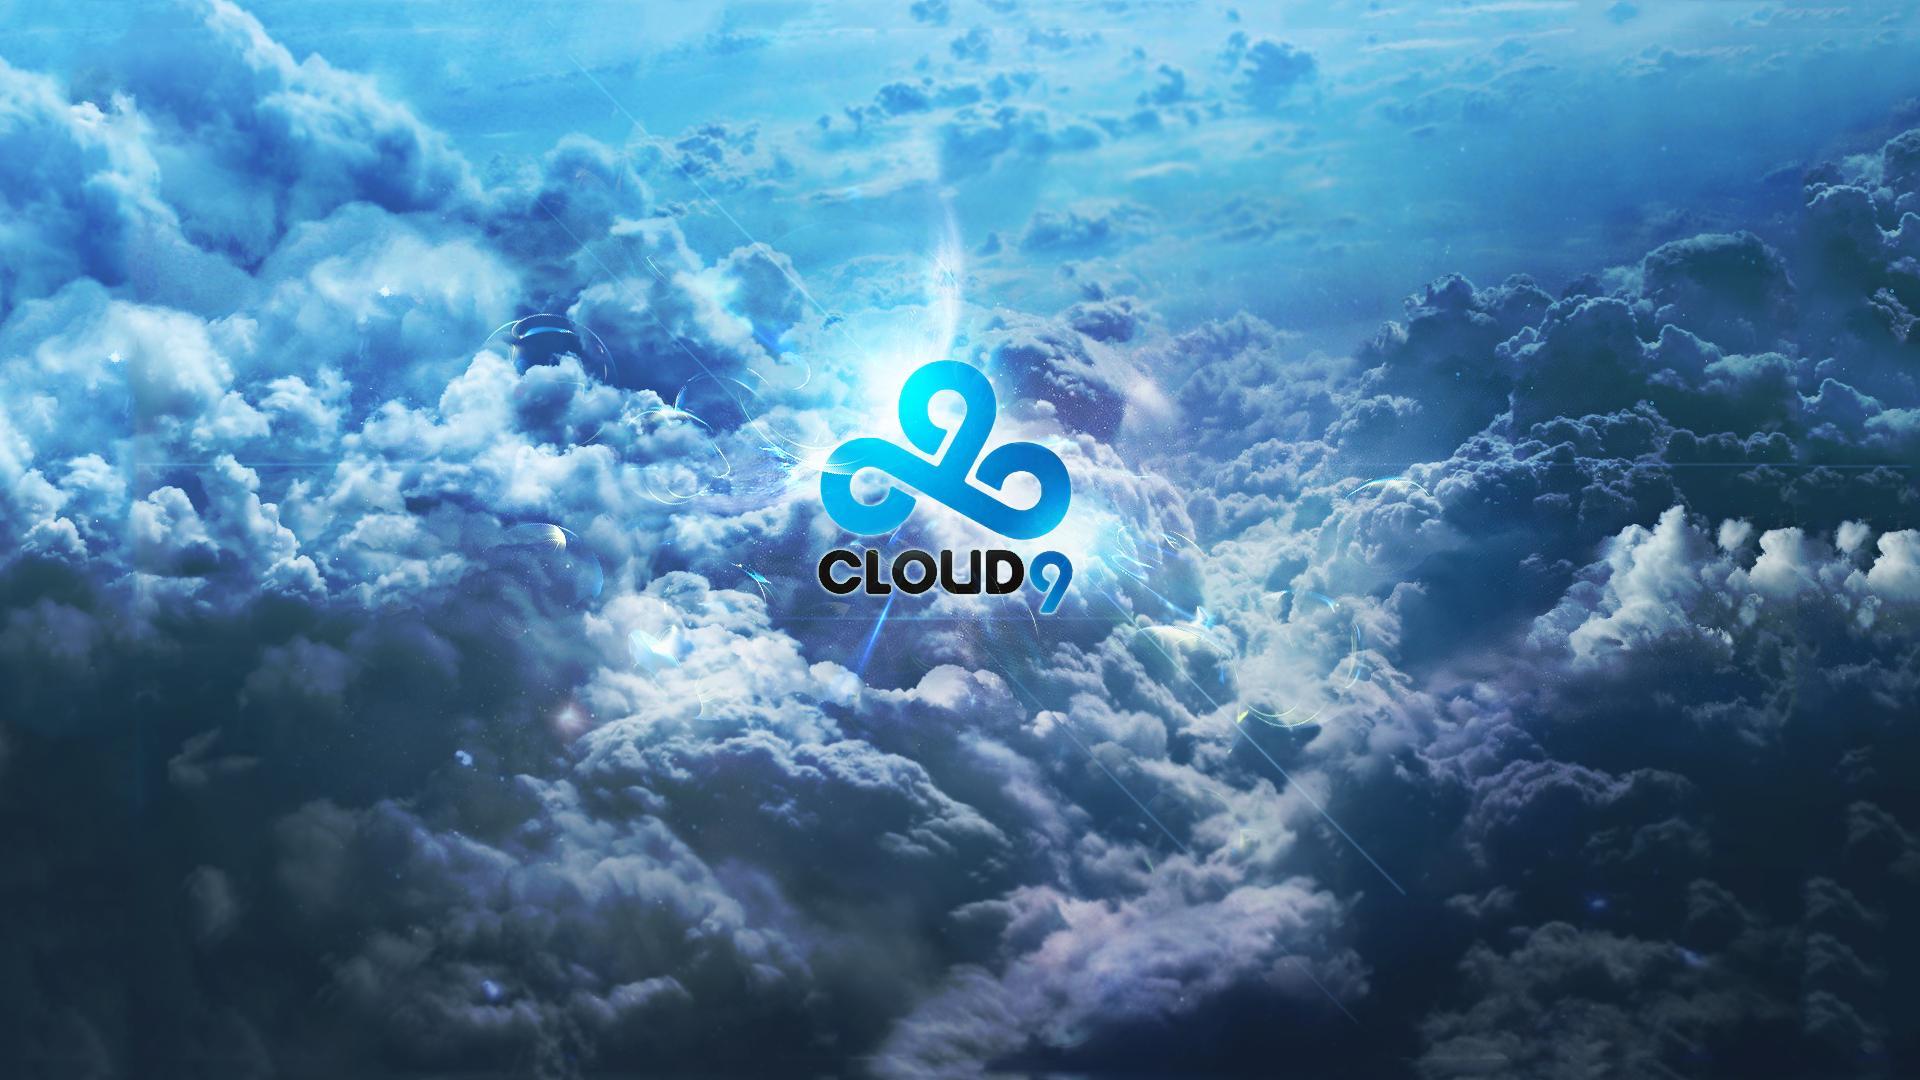 Utilidade wallpaper da cloud9 ionia news - Reddit cloud9 ...